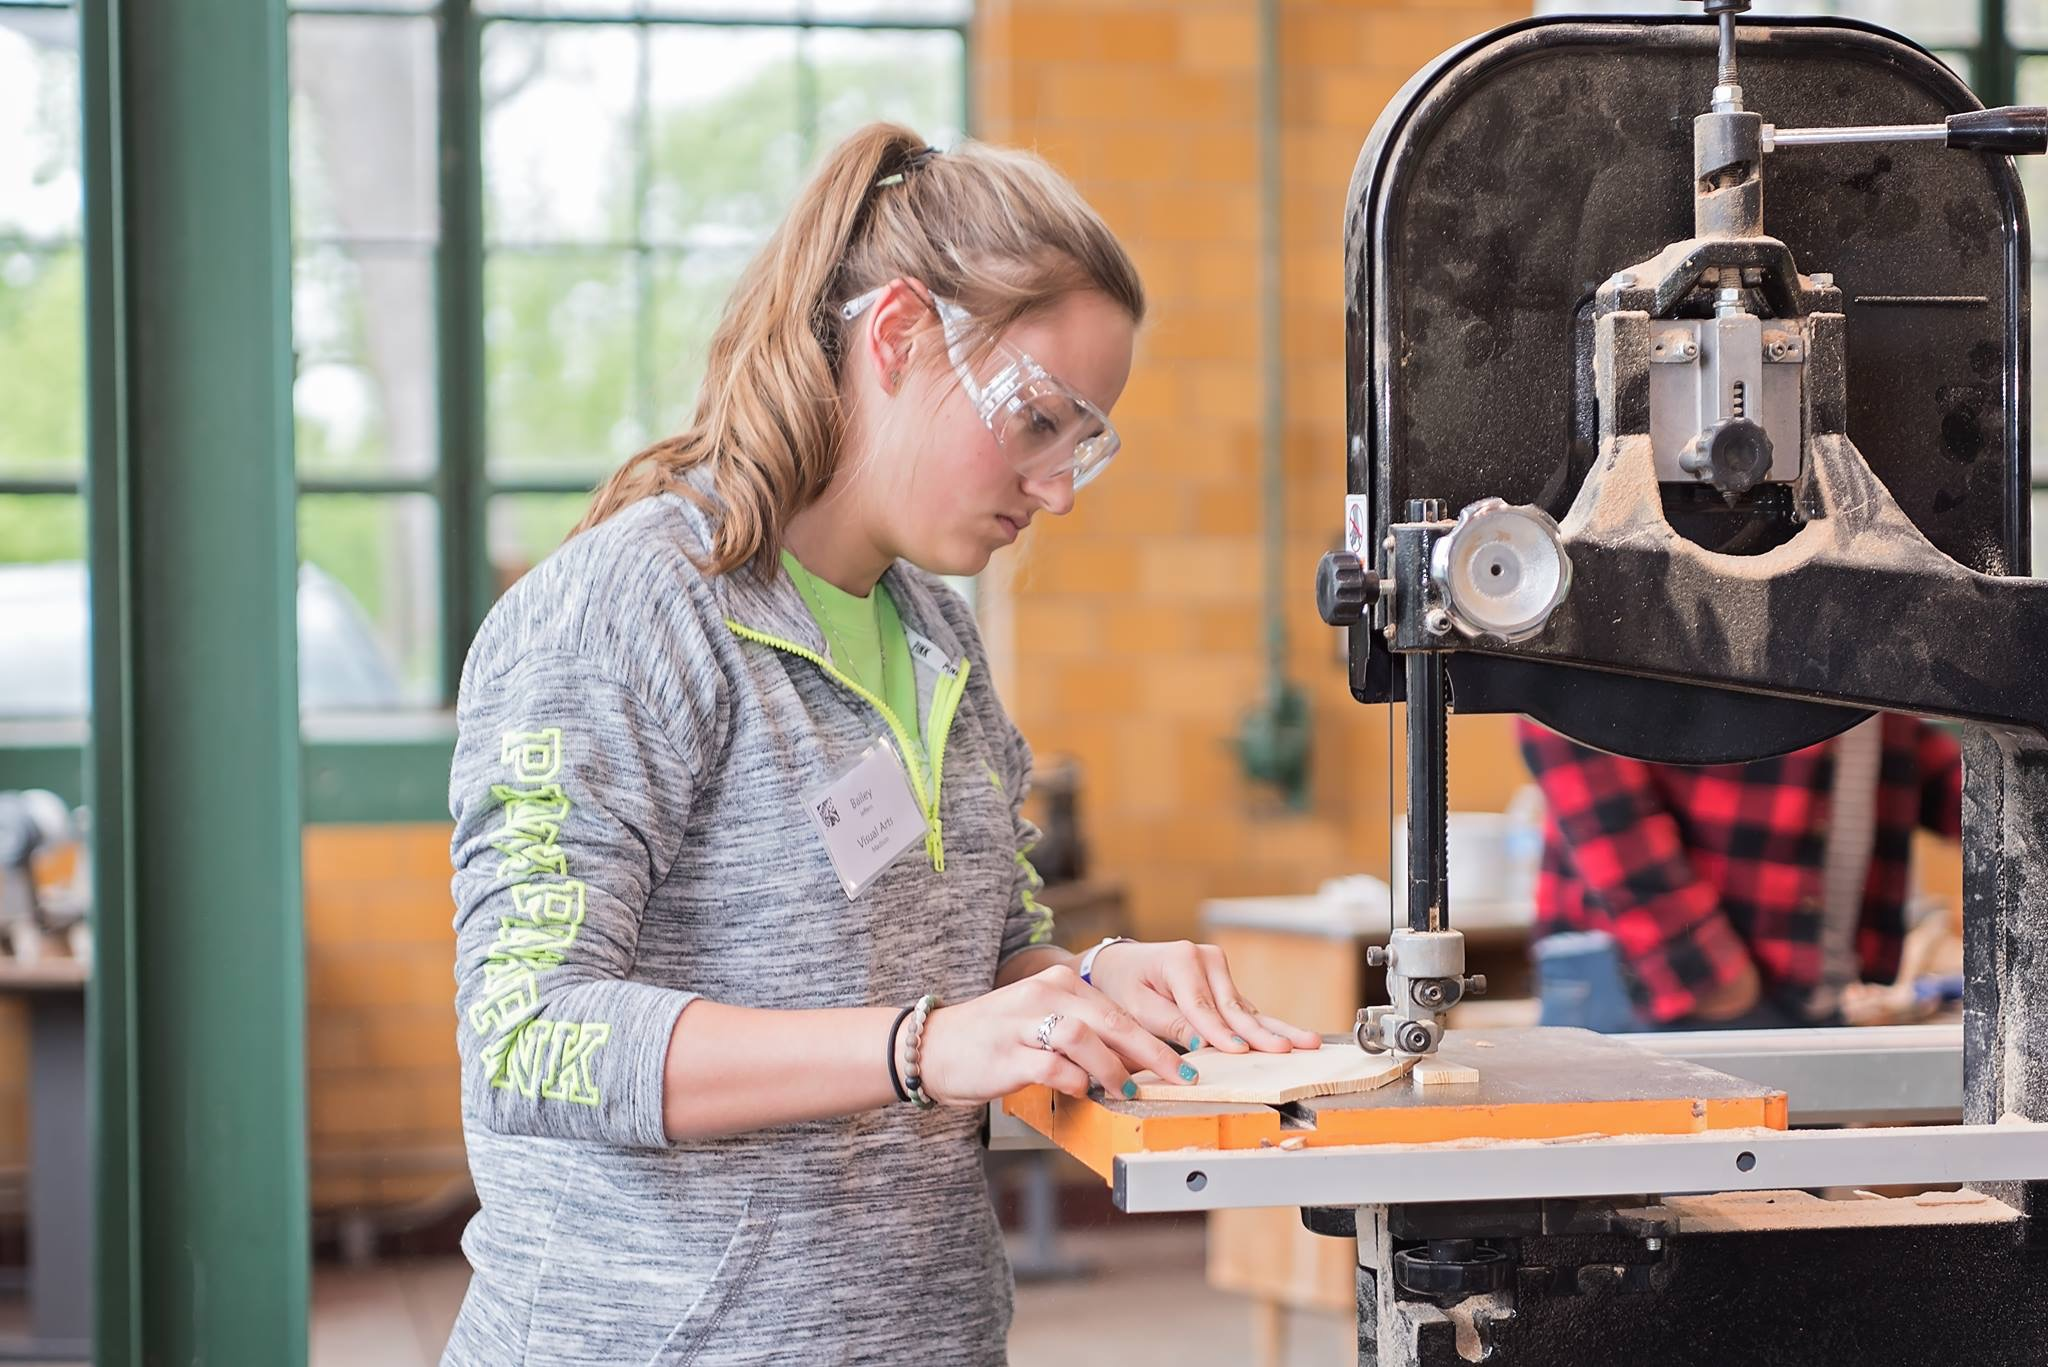 skilled trades education